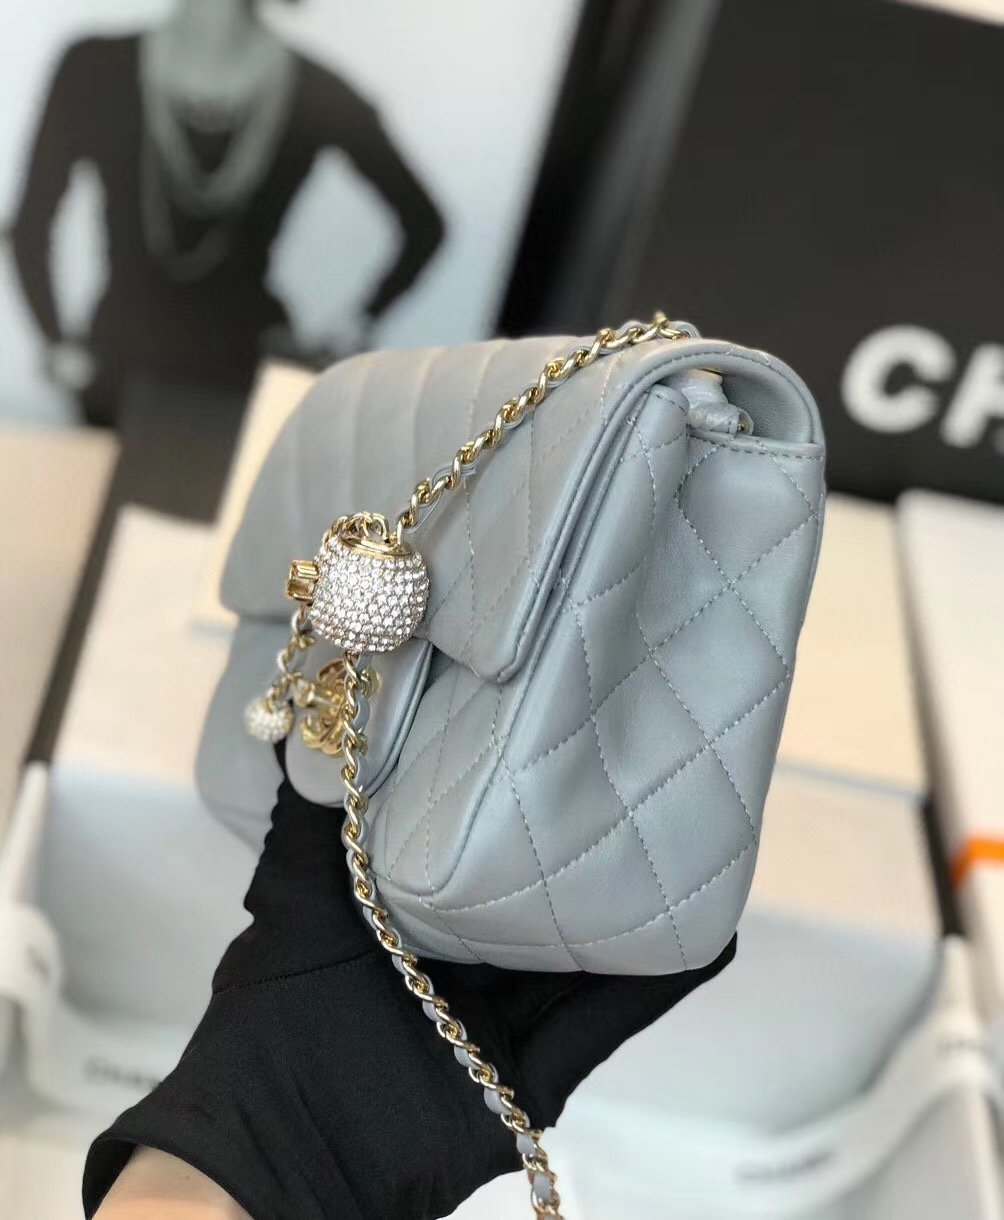 Chanel香奈儿专柜最新钻珠cf款(图6)